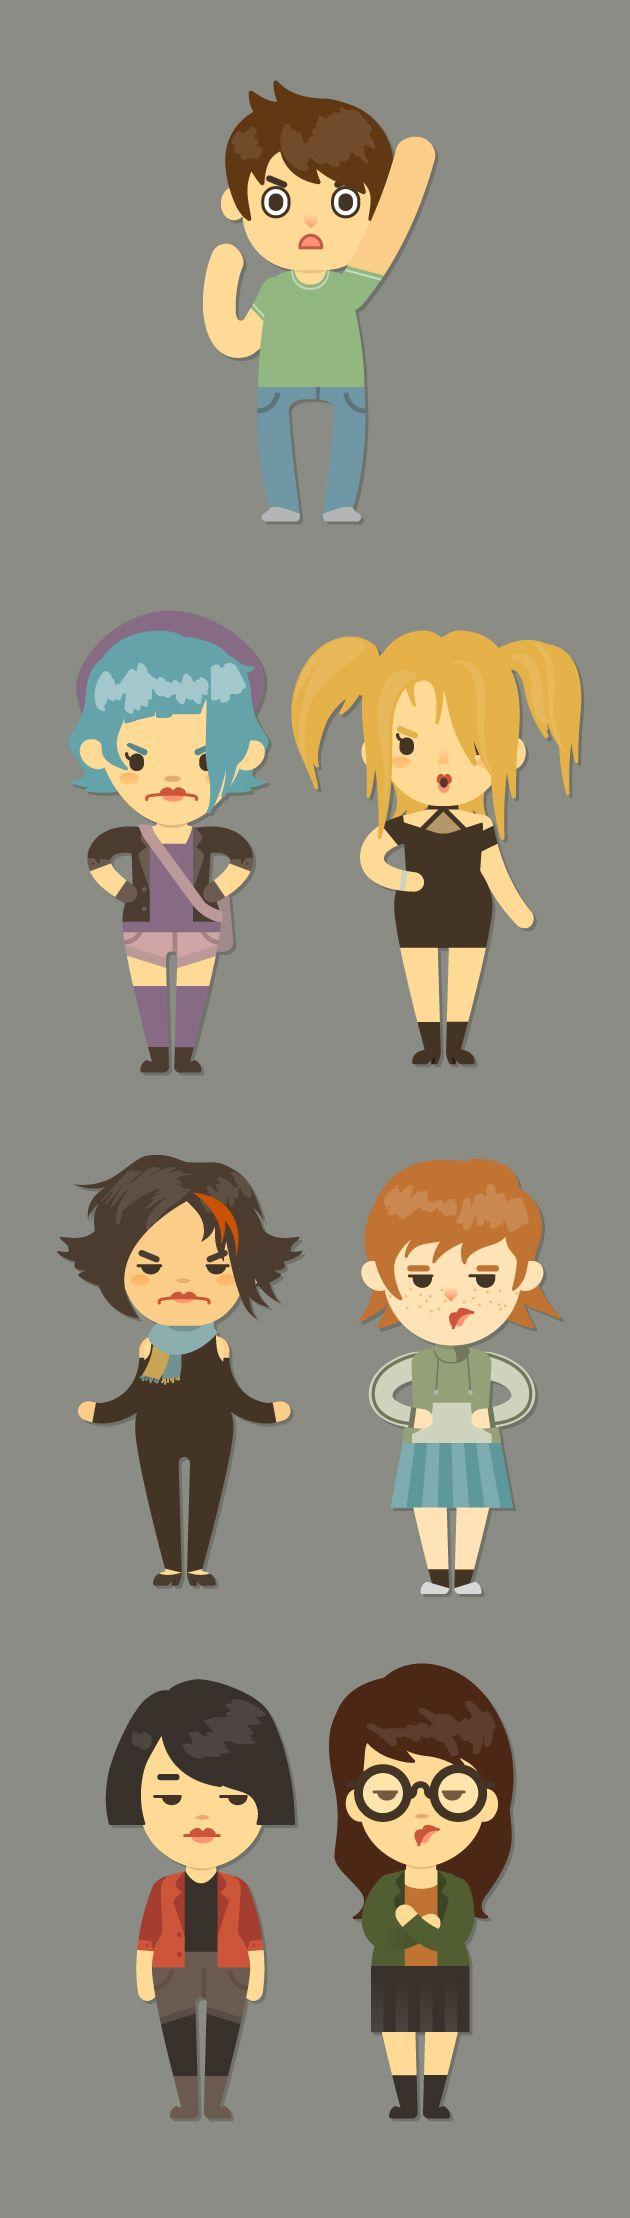 Cute cartoon character generator on behance